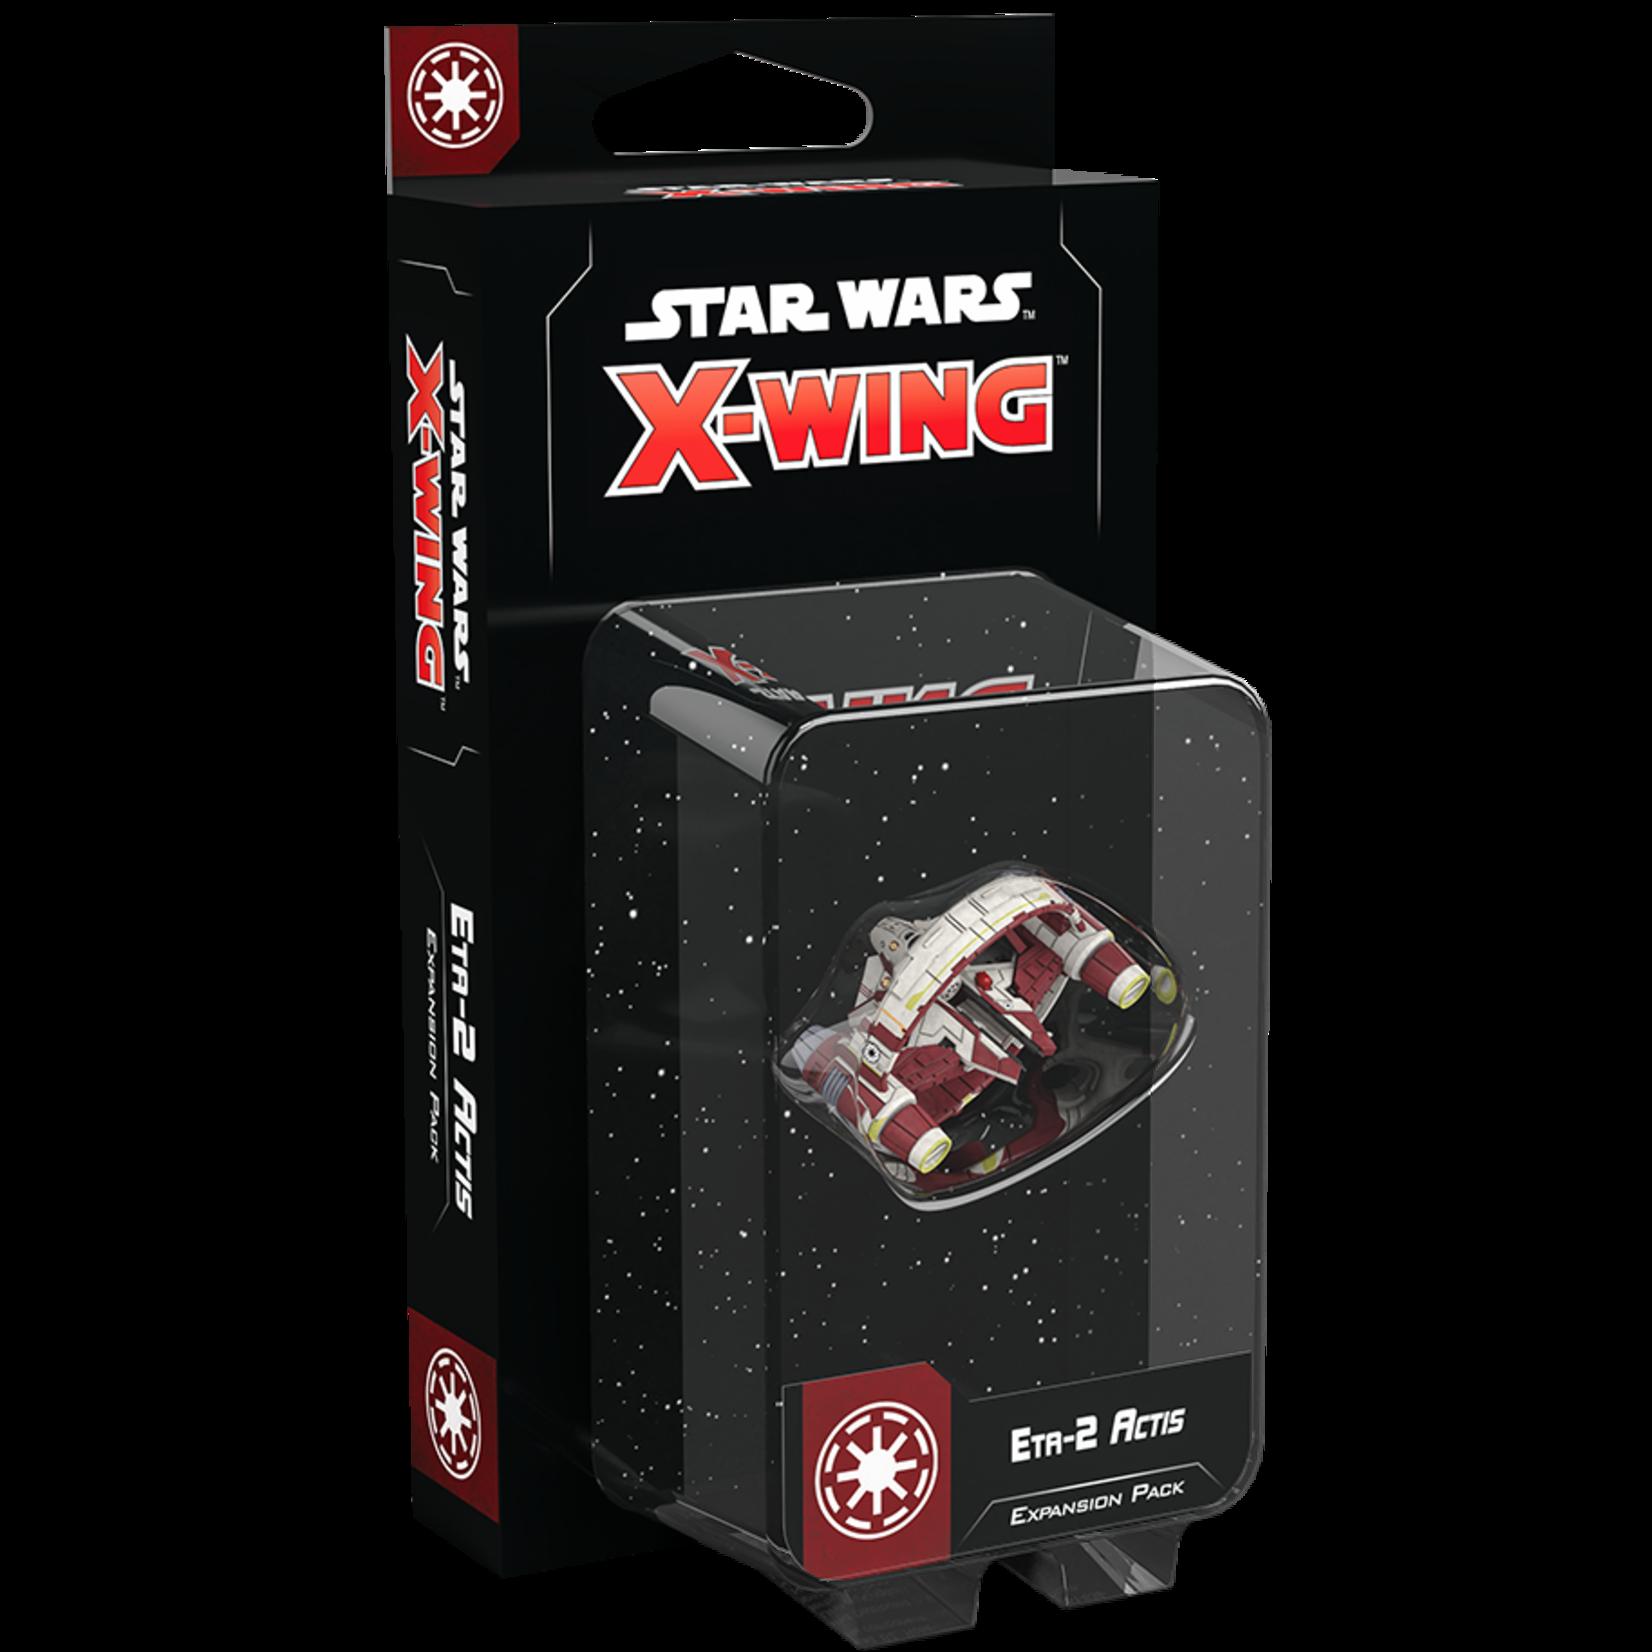 Fantasy Flight Games Star Wars X-Wing 2nd Edition: Eta-2 Actis Expansion